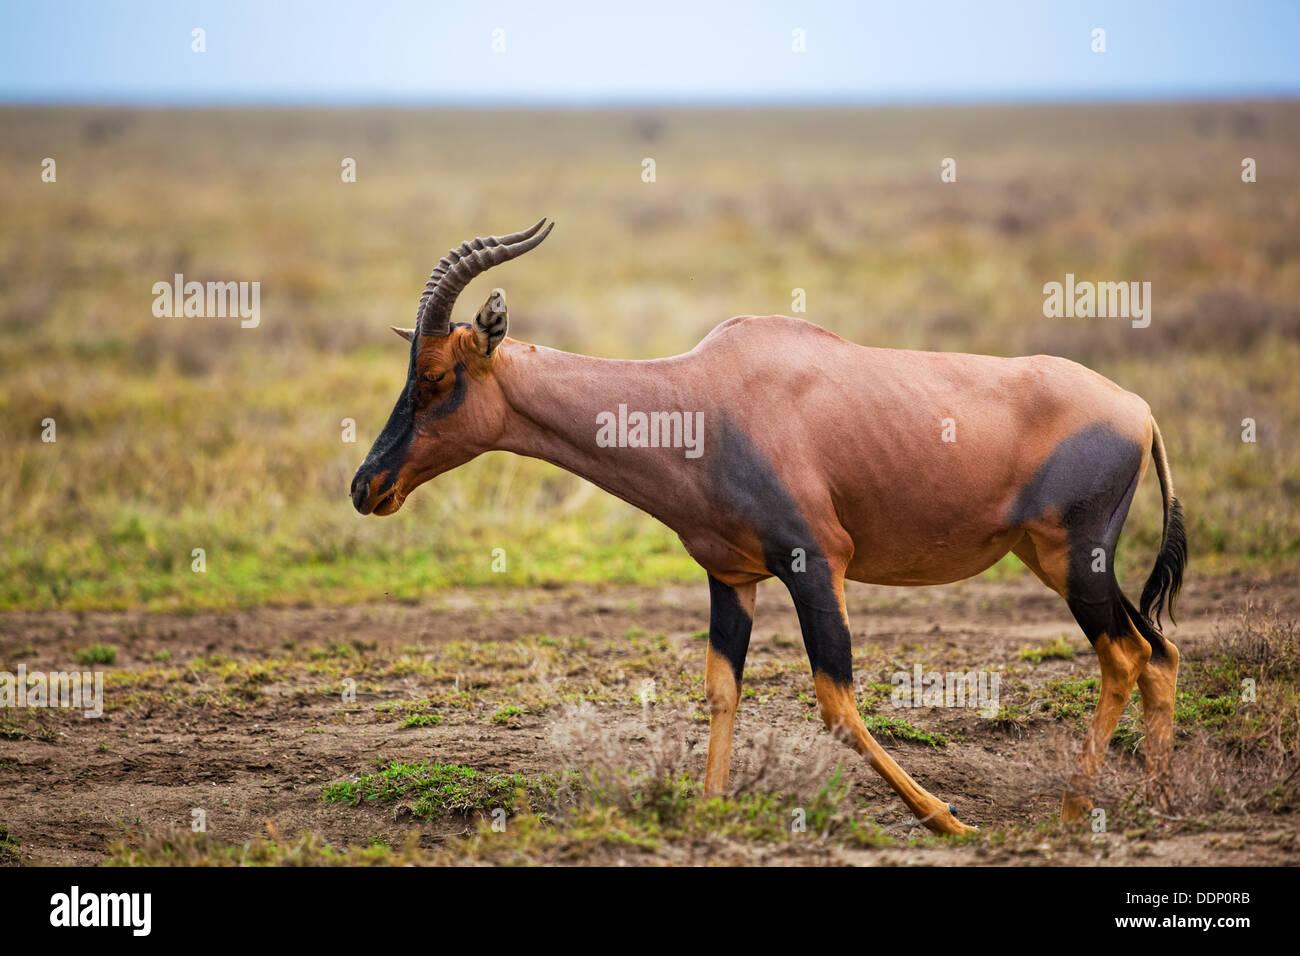 Topi (Damaliscus korrigum), a grassland antelope on savanna in the Serengeti, Tanzania, Africa - Stock Image